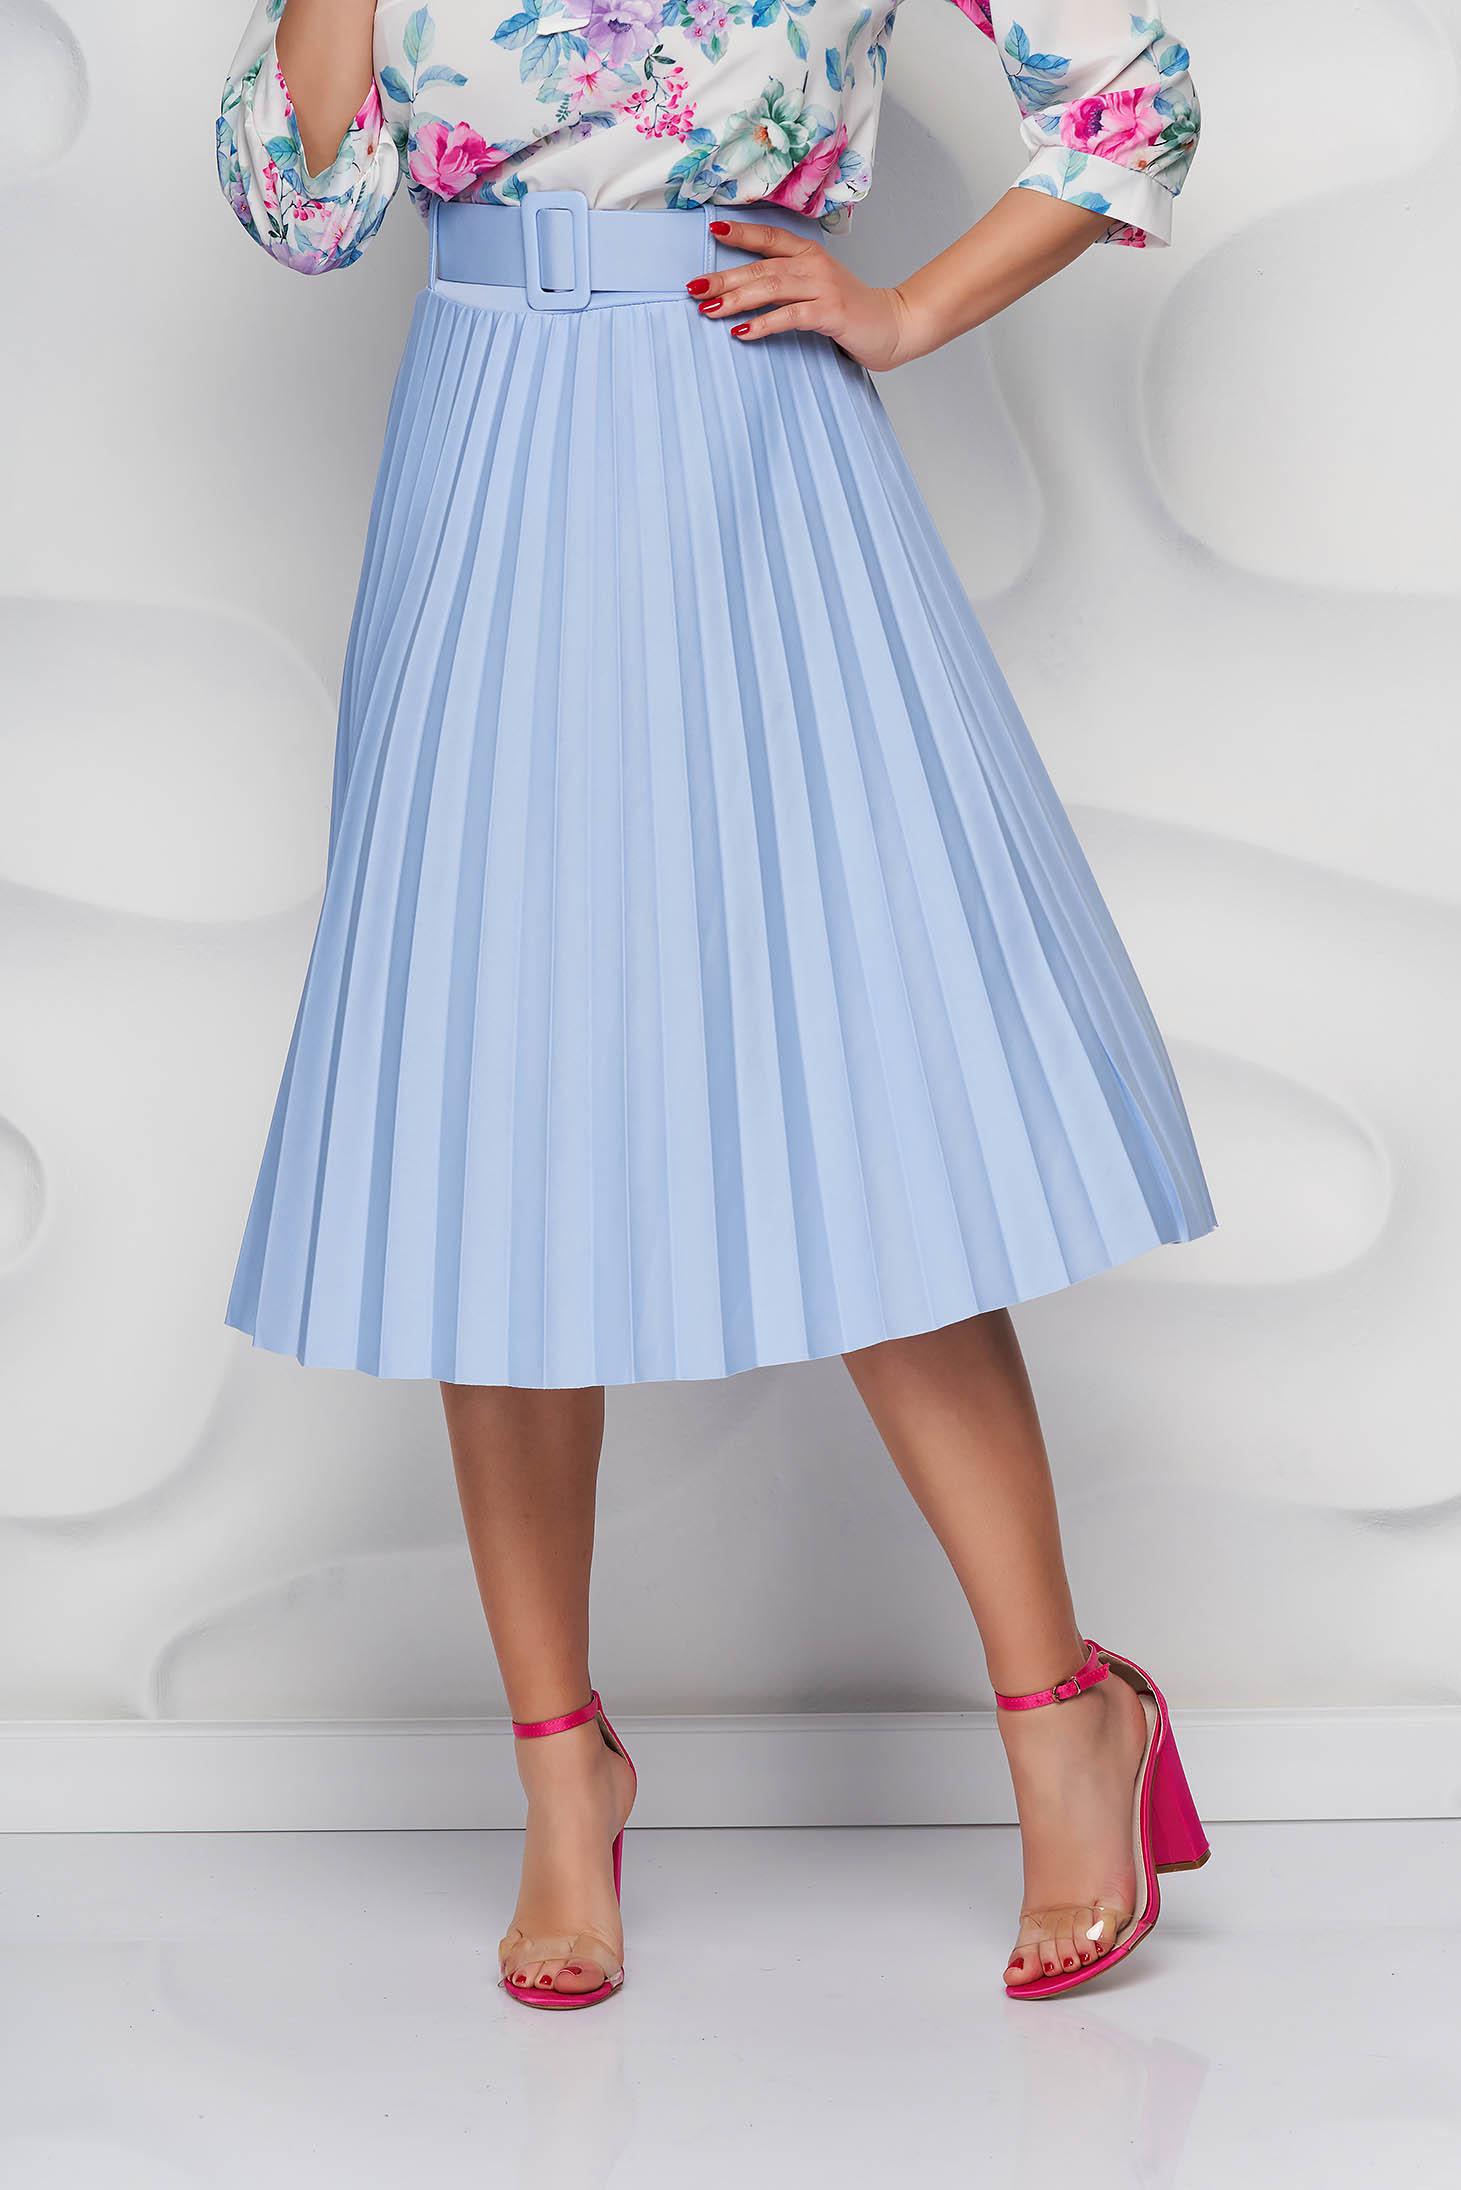 Lightblue skirt cloche accessorized with belt slightly elastic fabric folded up